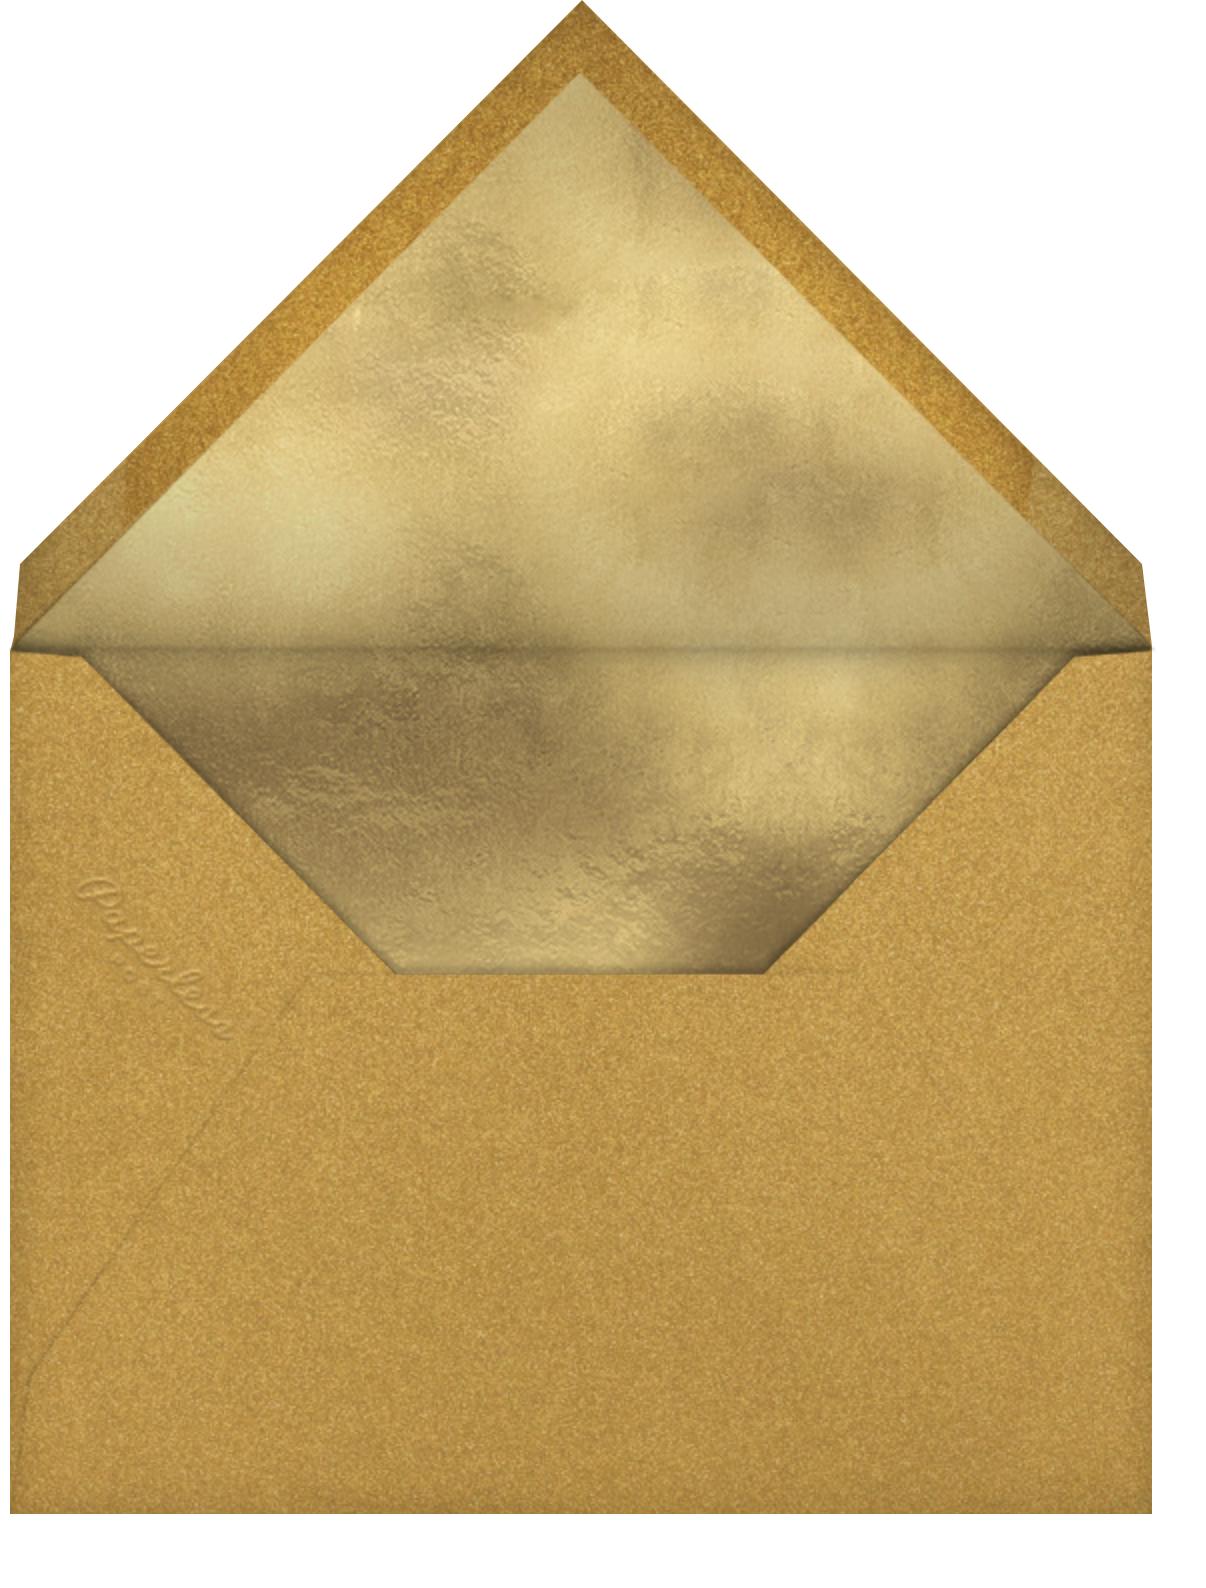 Vinayanka (Invitation) - White - Paperless Post - Envelope